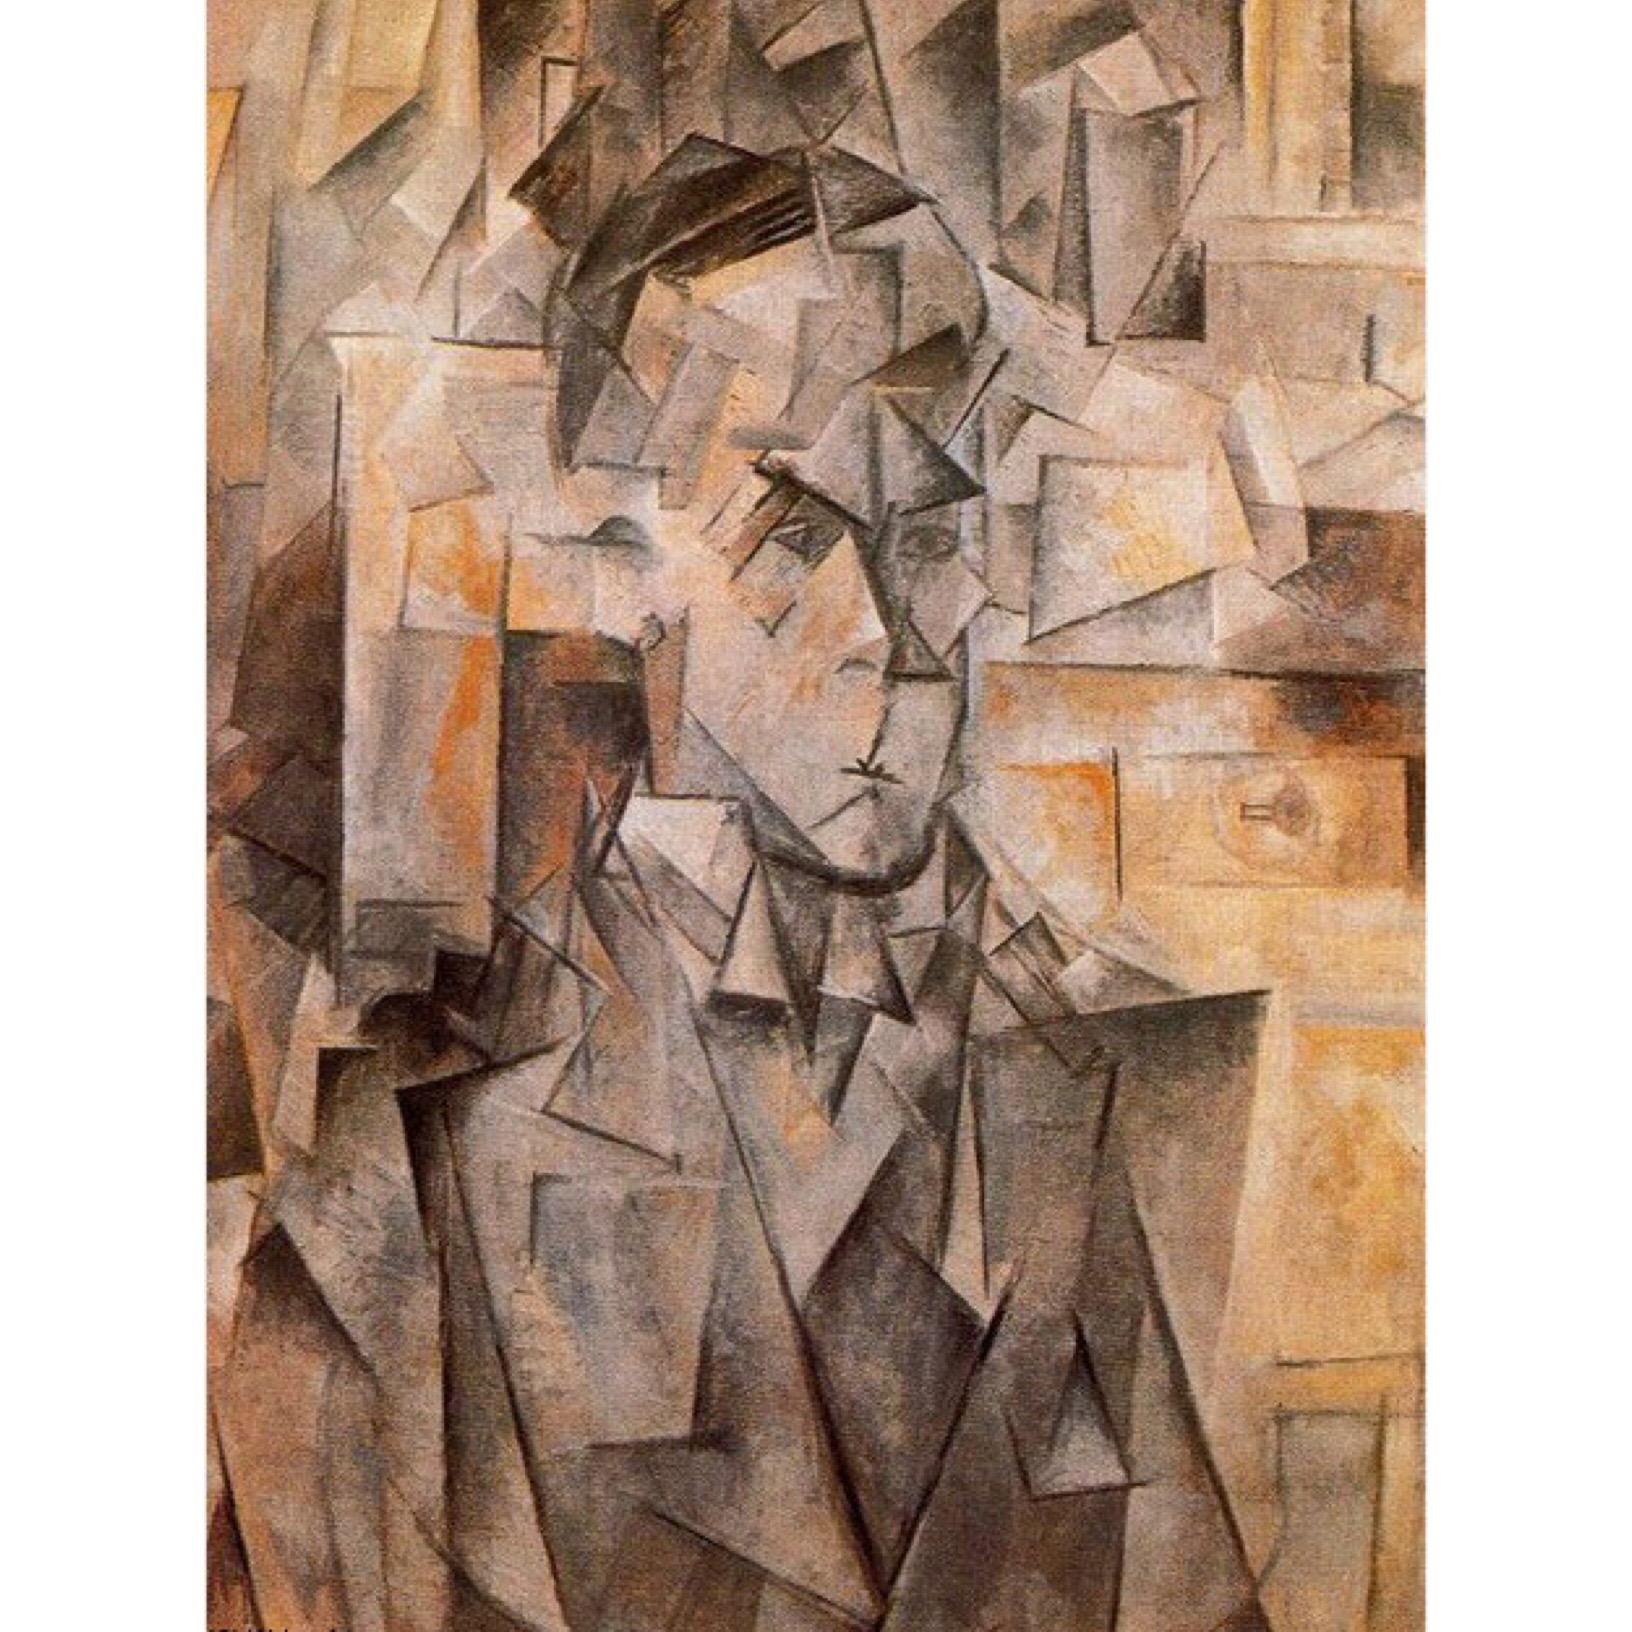 Portrait of Wilhelm Uhde by Pablo Picasso, 1910